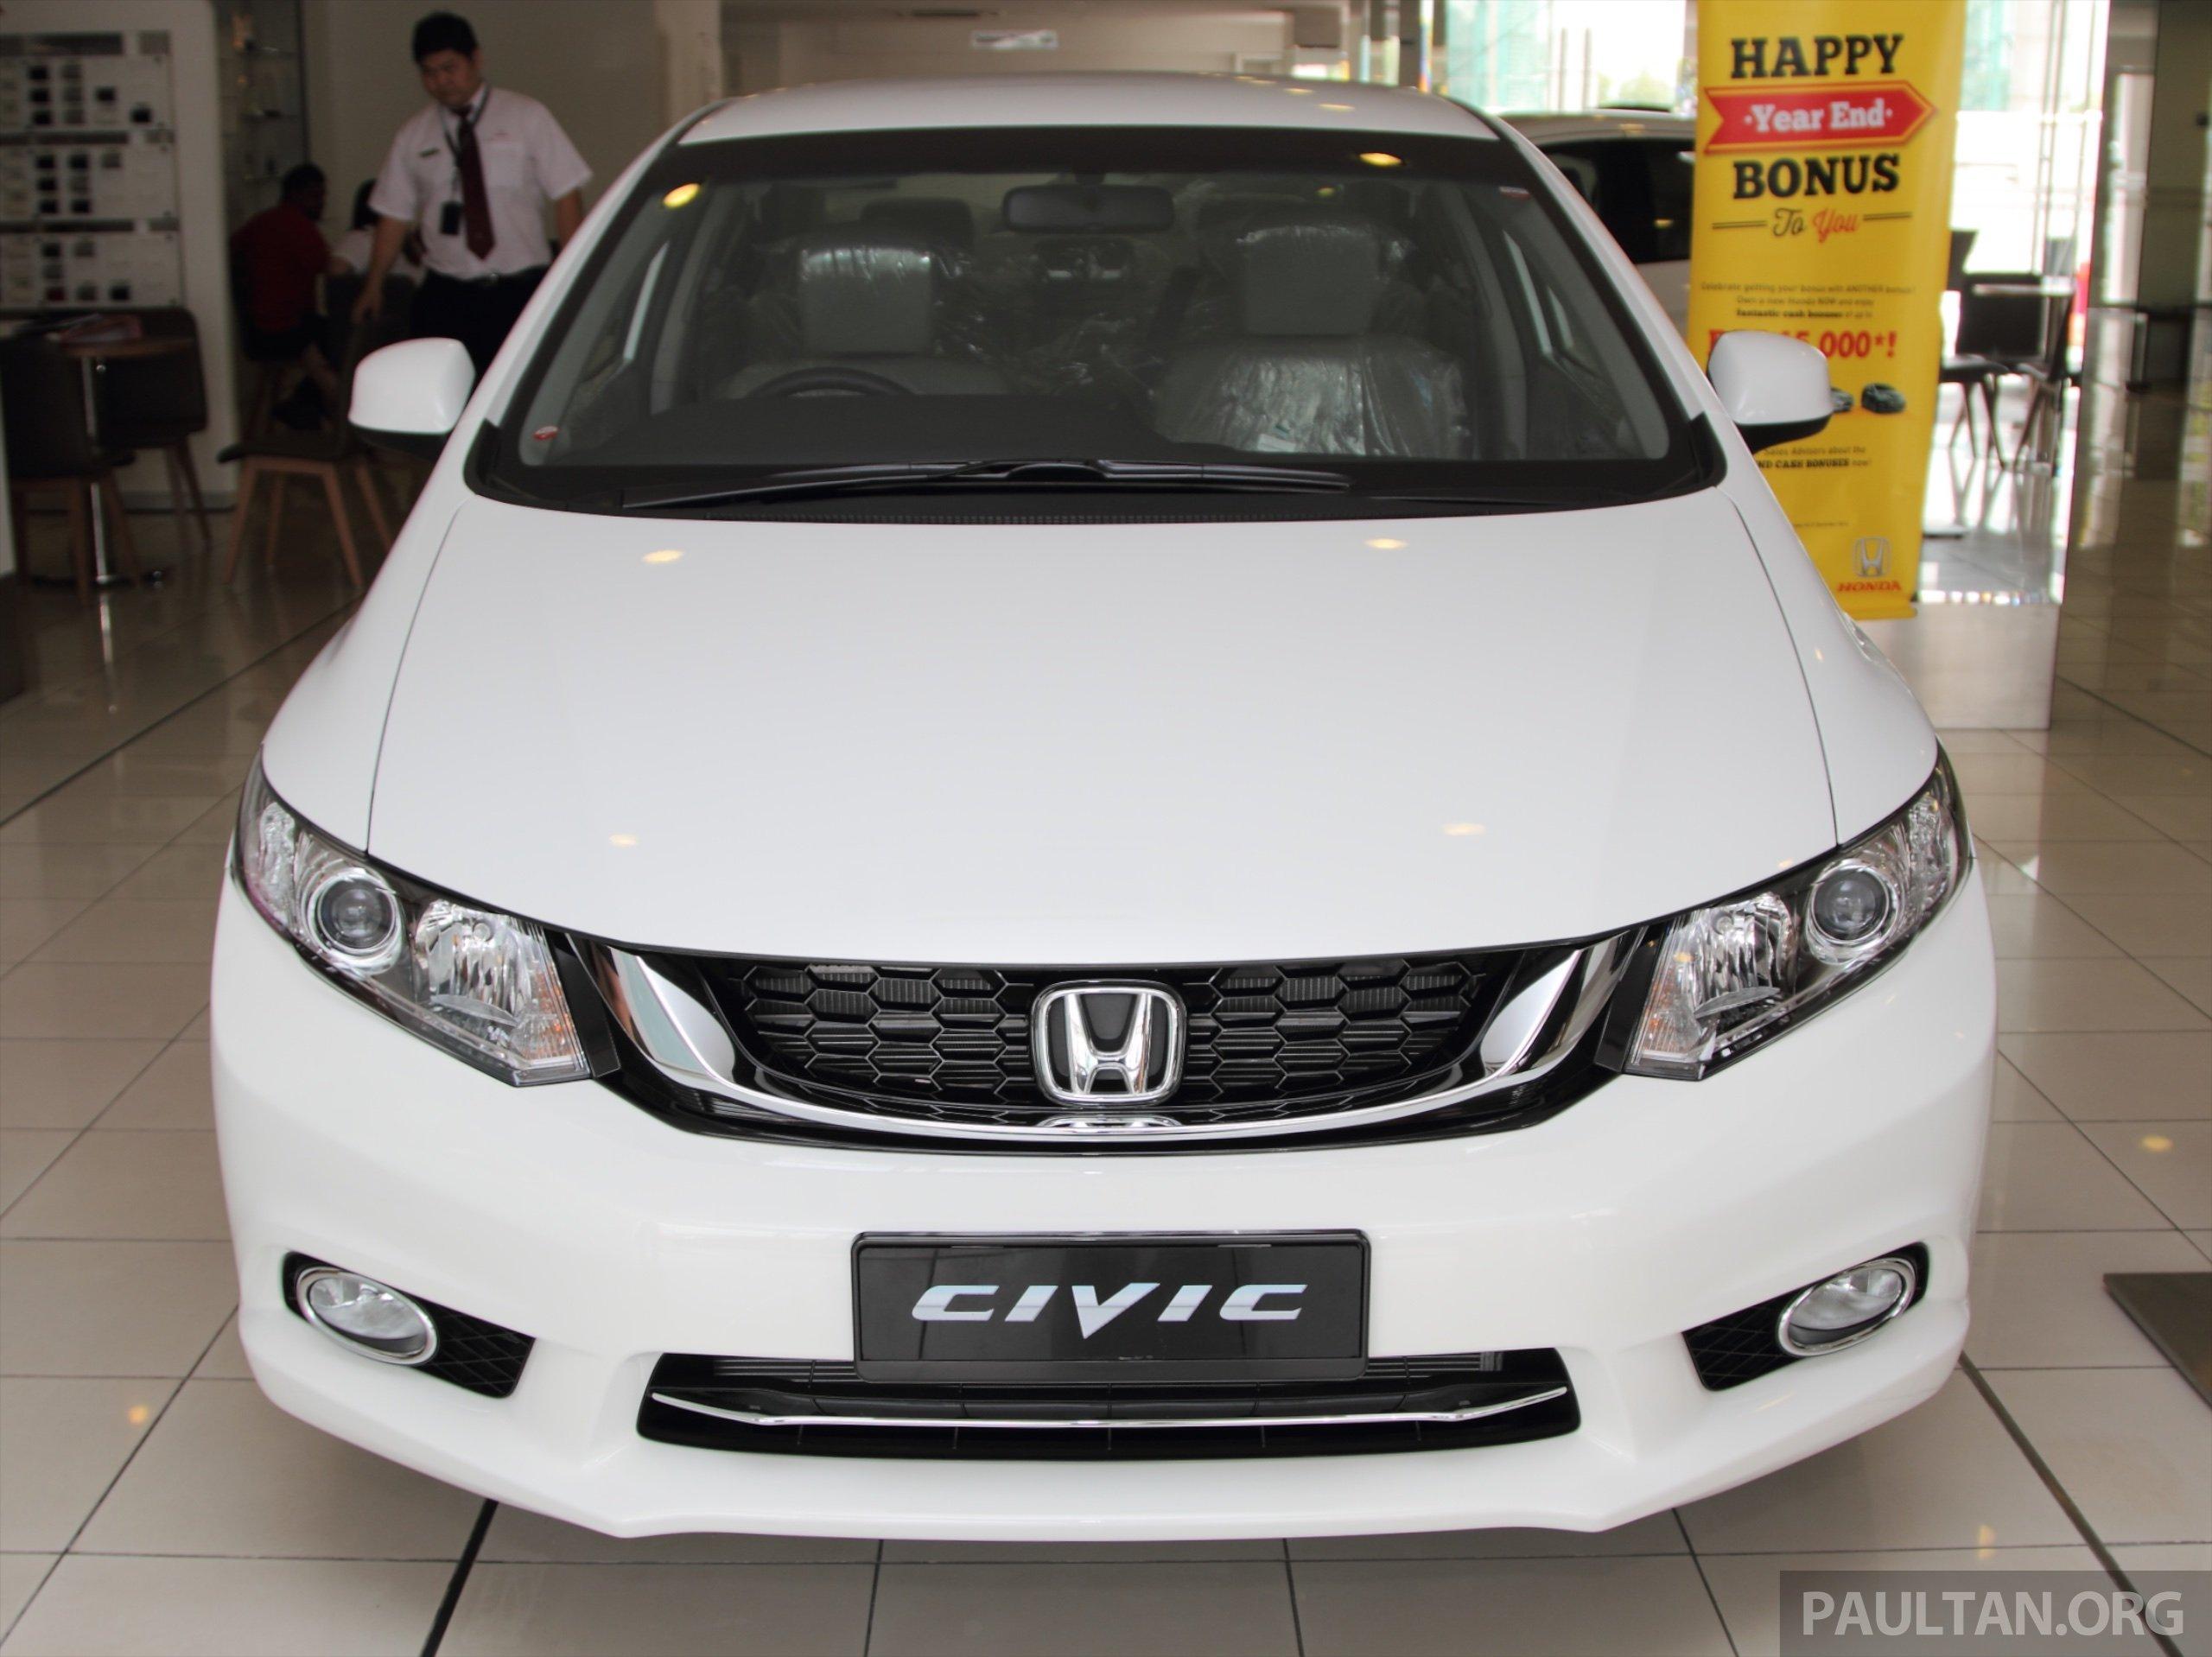 2014 civic si bodykit malaysia autos post